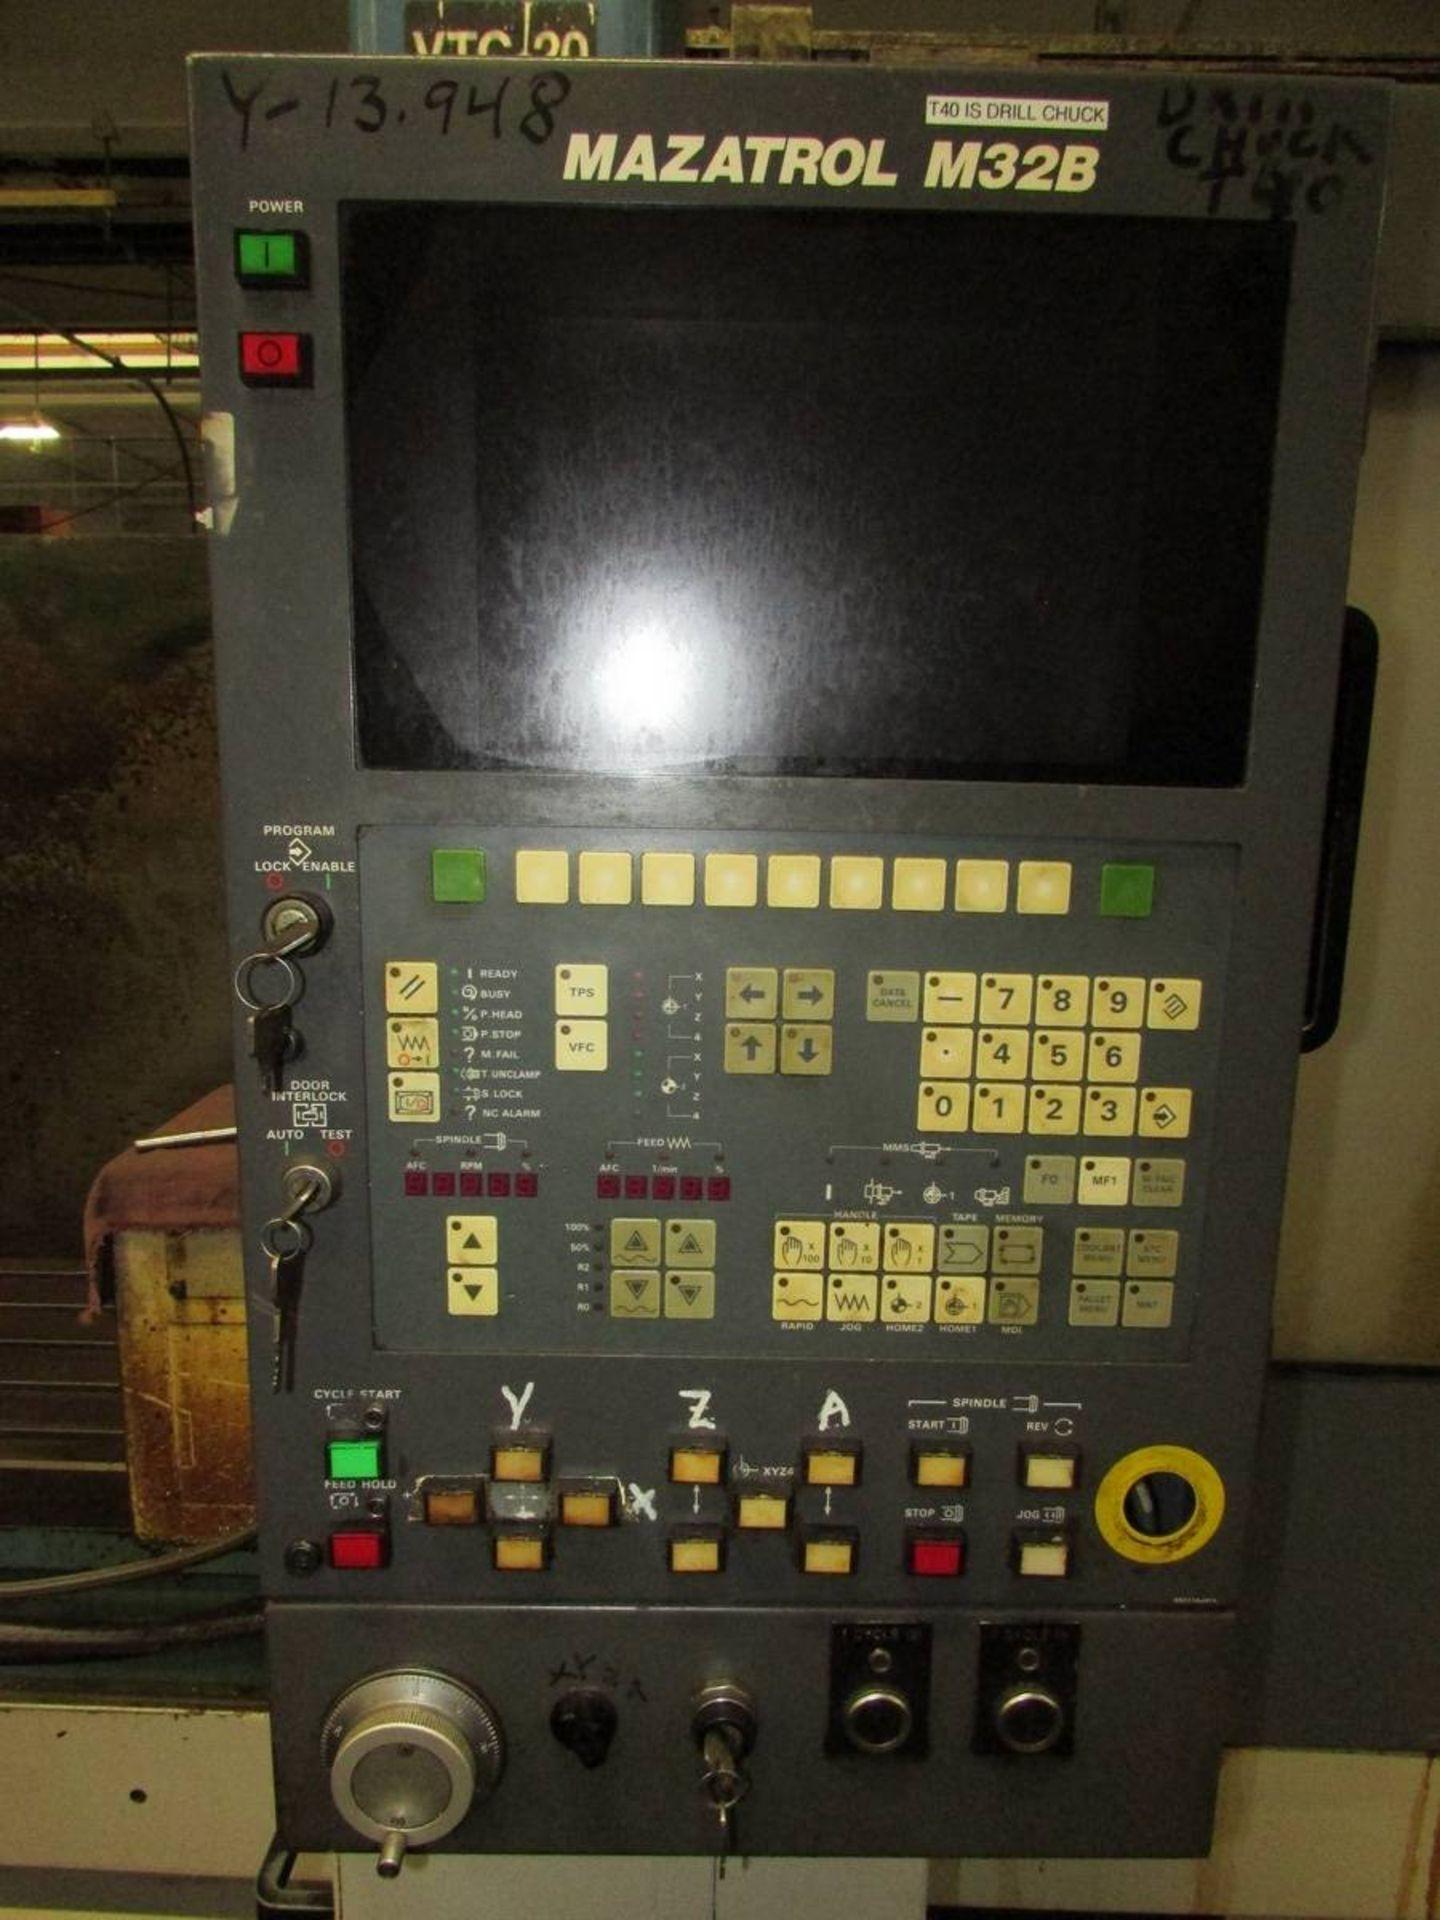 1996 Mazak VTC-20C Vertical Traveling Column 3-Axis CNC Machining Center - Image 12 of 20